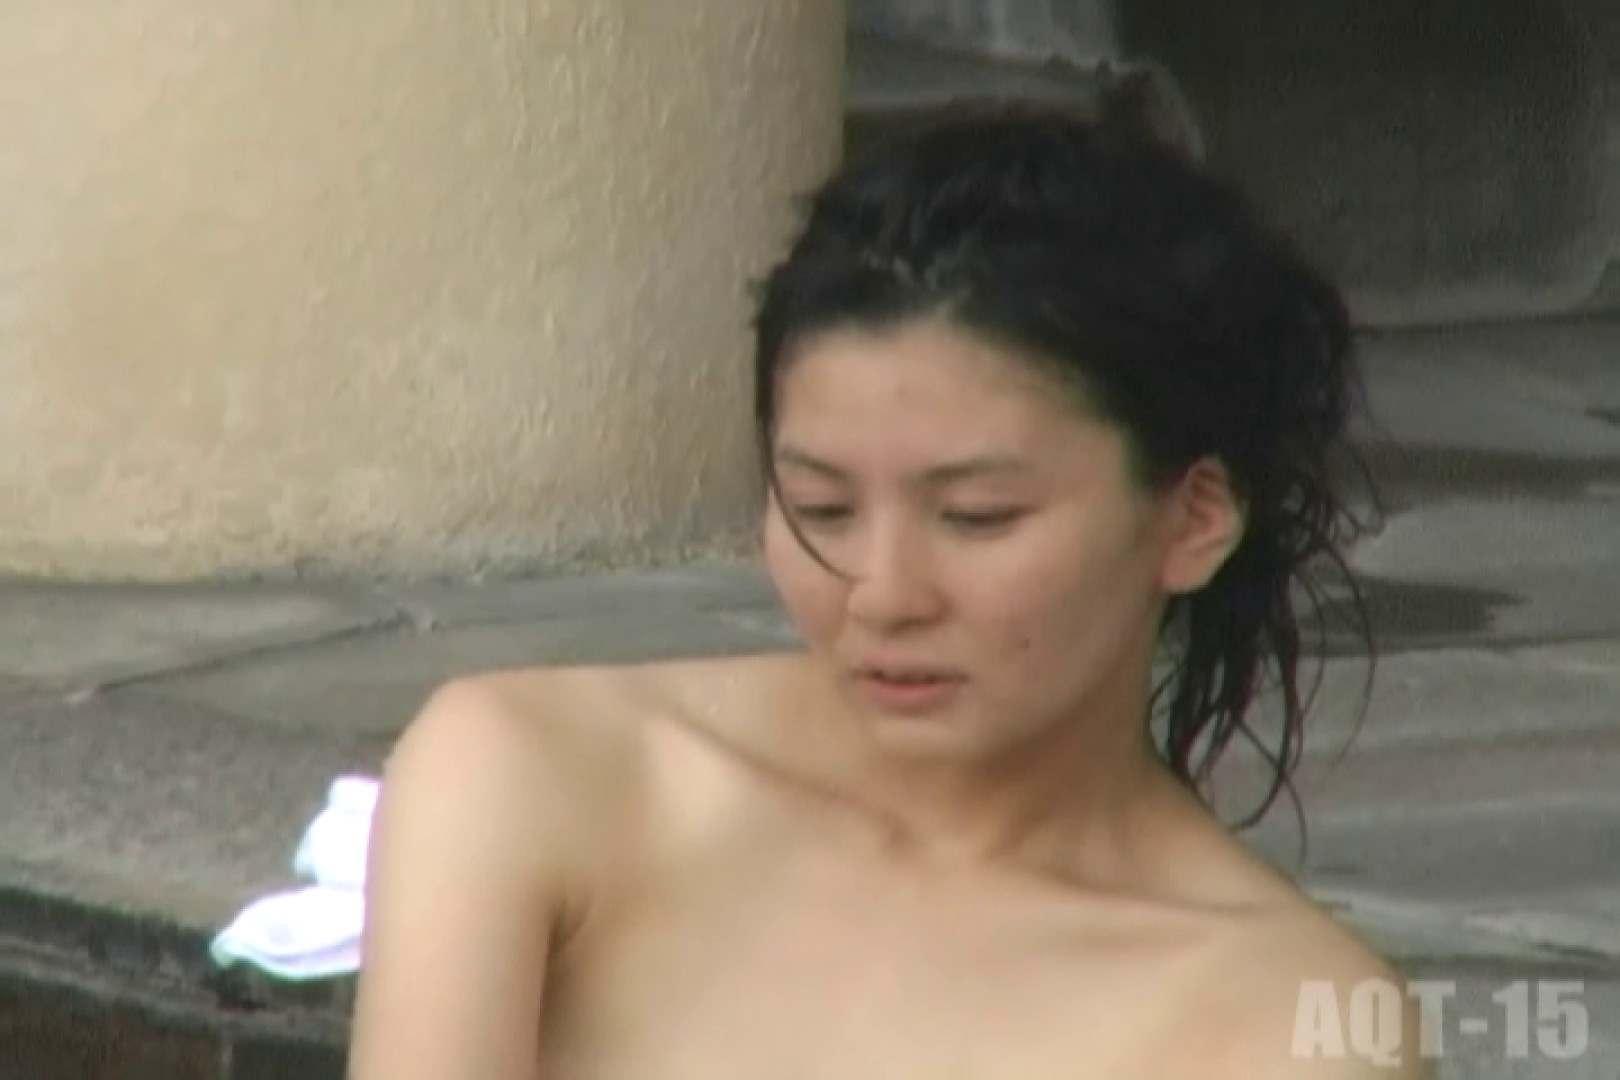 Aquaな露天風呂Vol.832 露天 オマンコ無修正動画無料 93連発 47